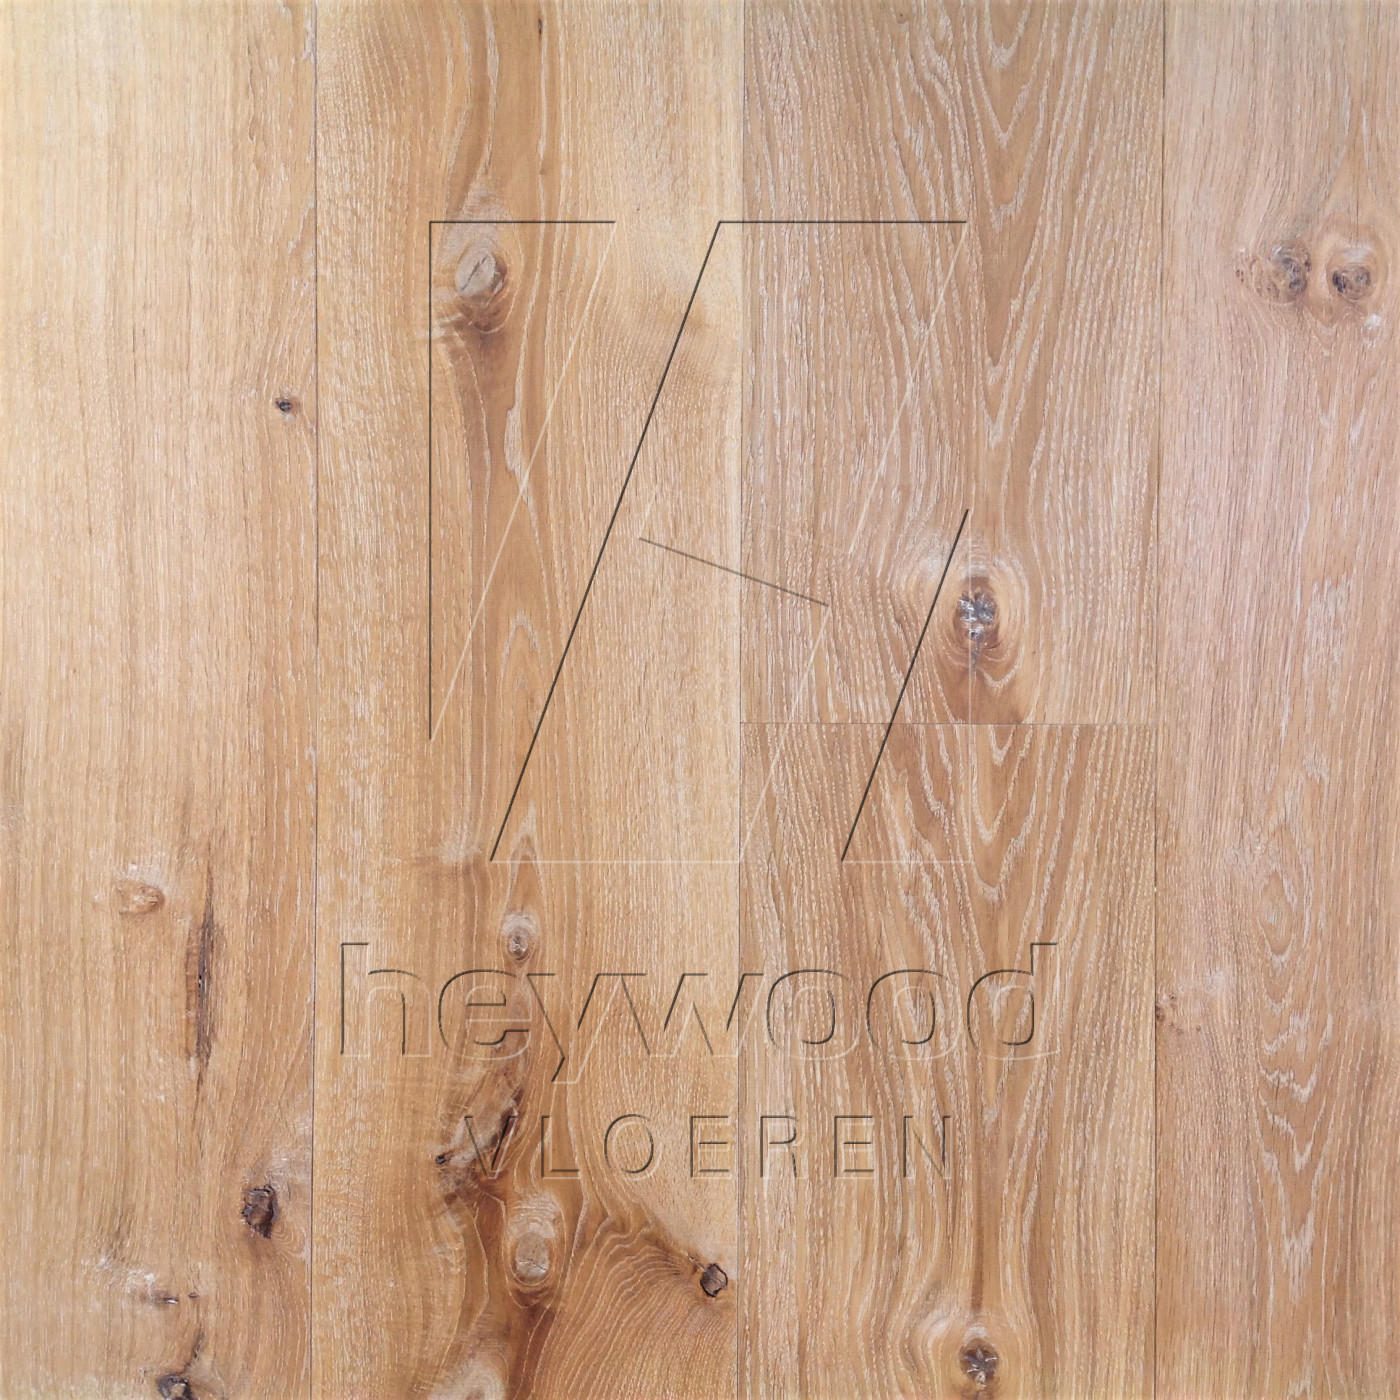 Plank Tignes in European Oak Character of Bespoke Wooden Floors